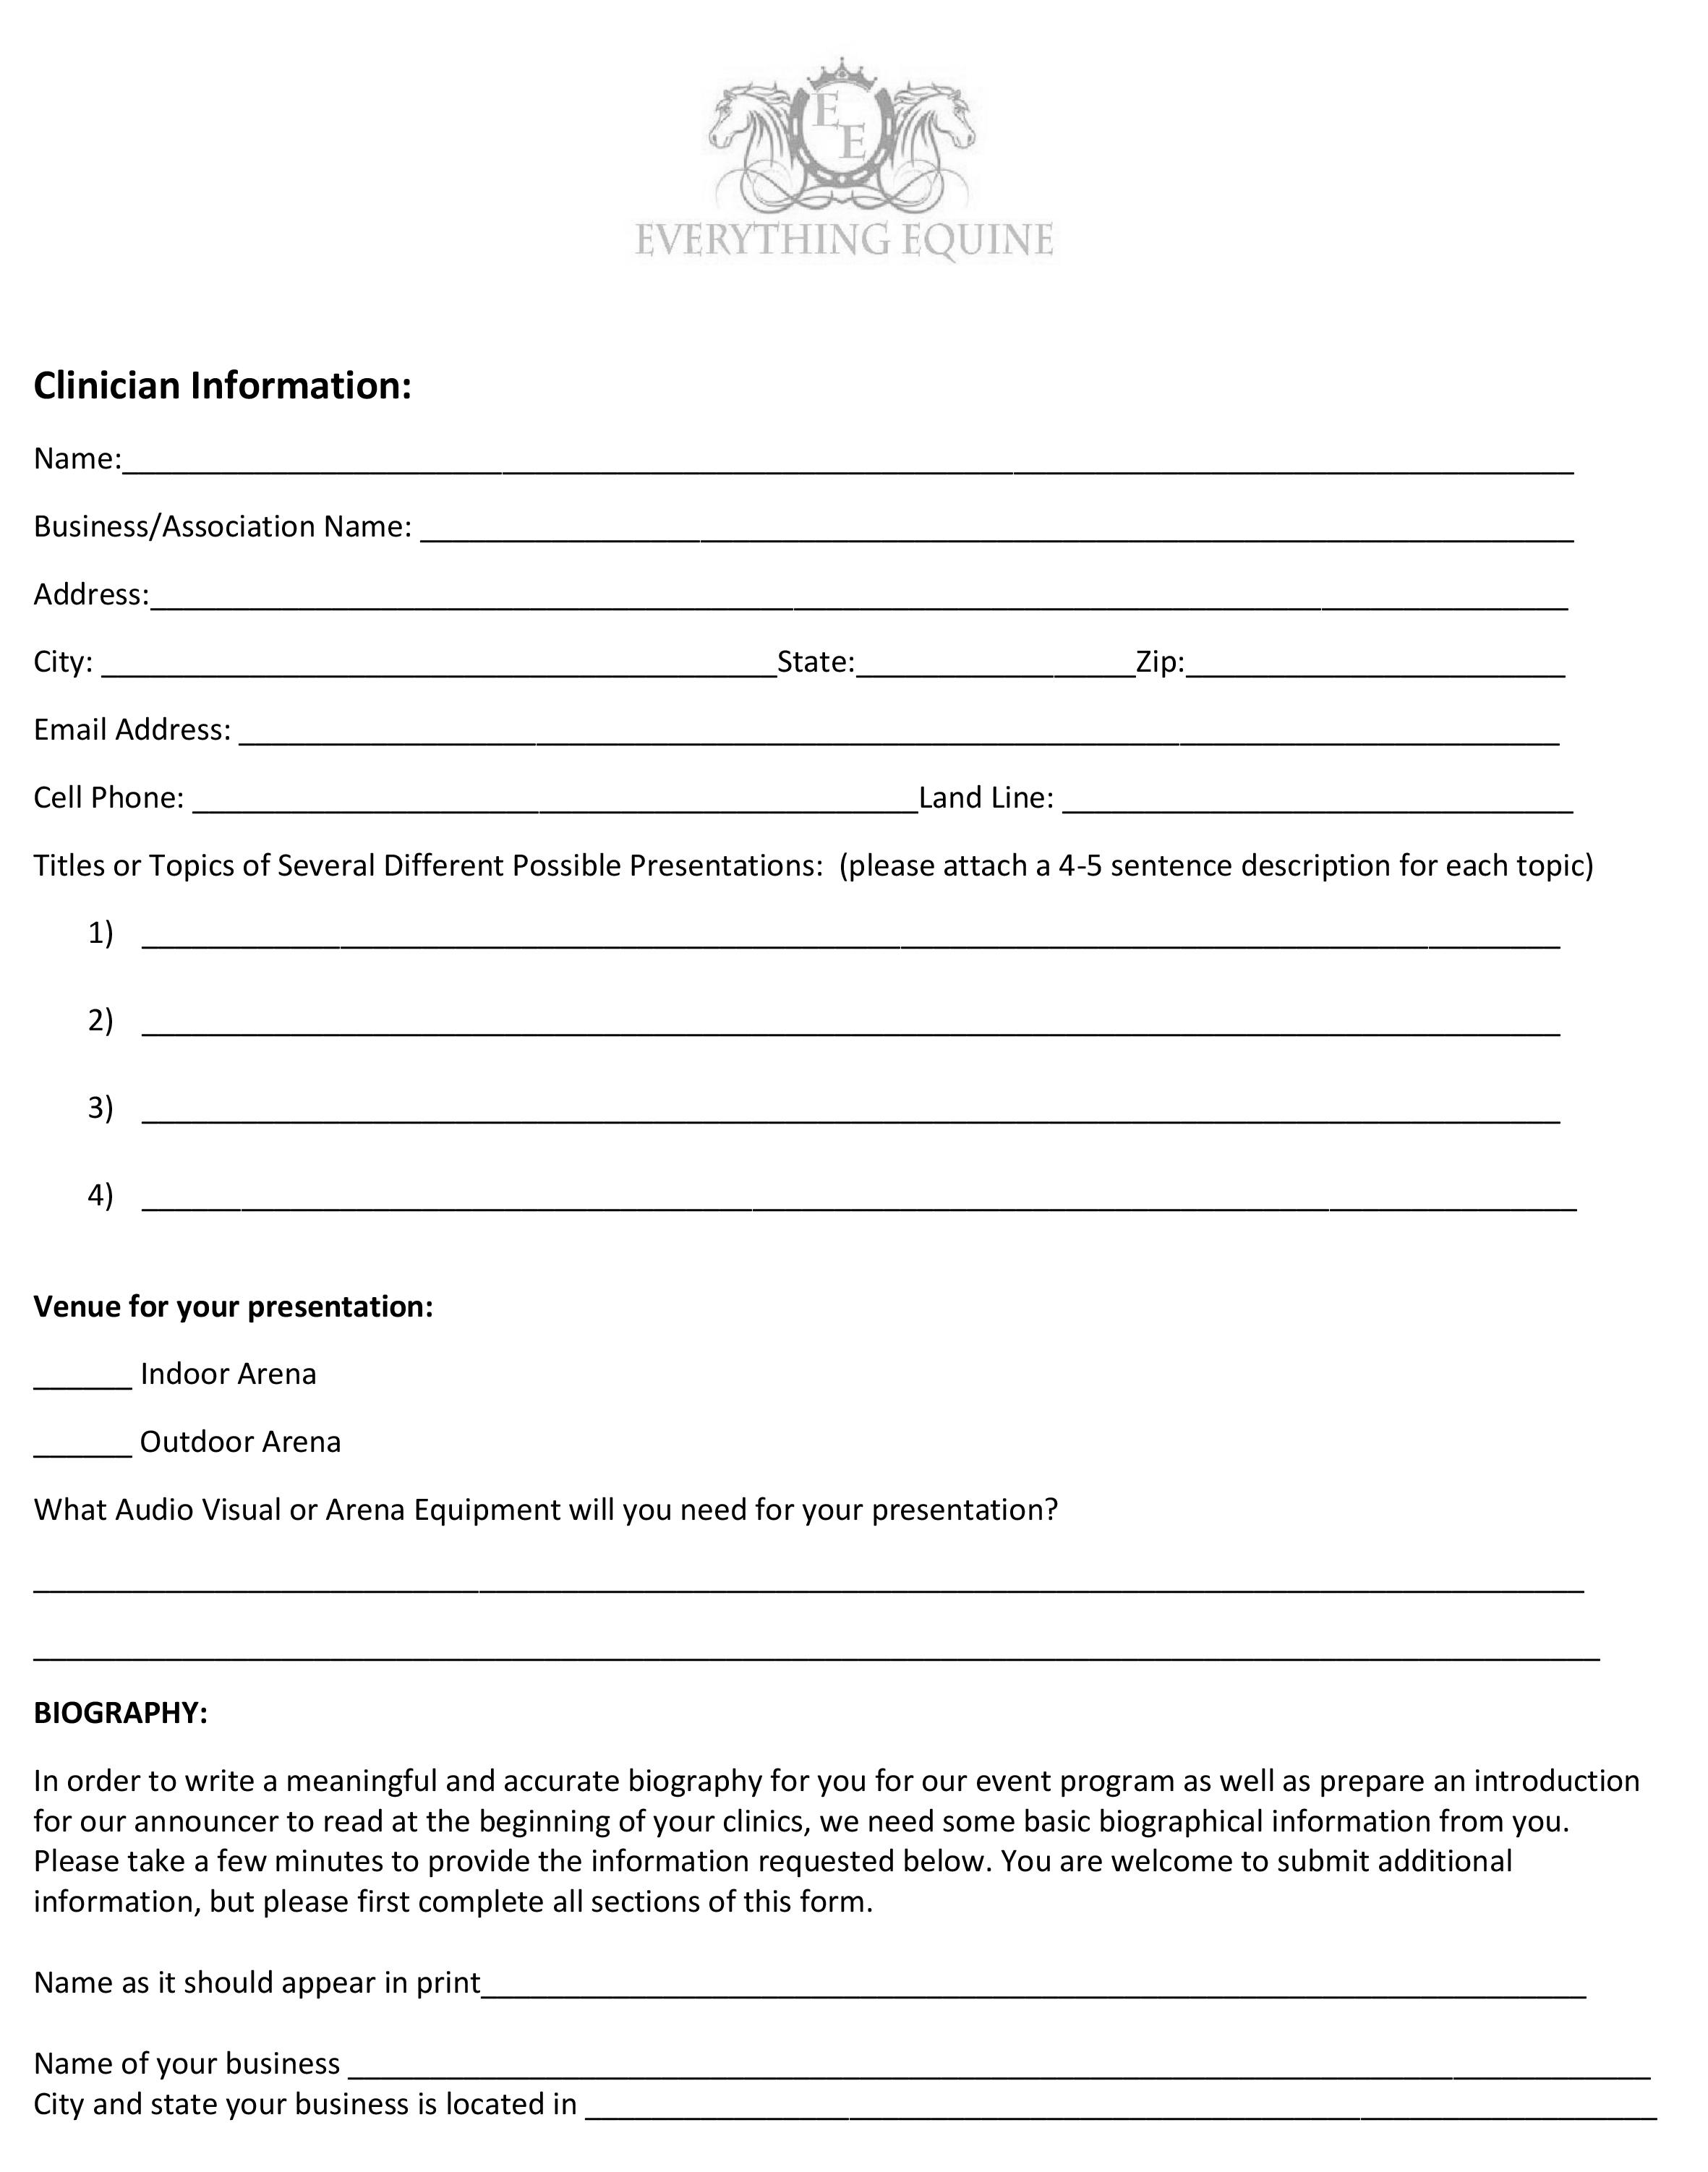 Clinician Ap page 1